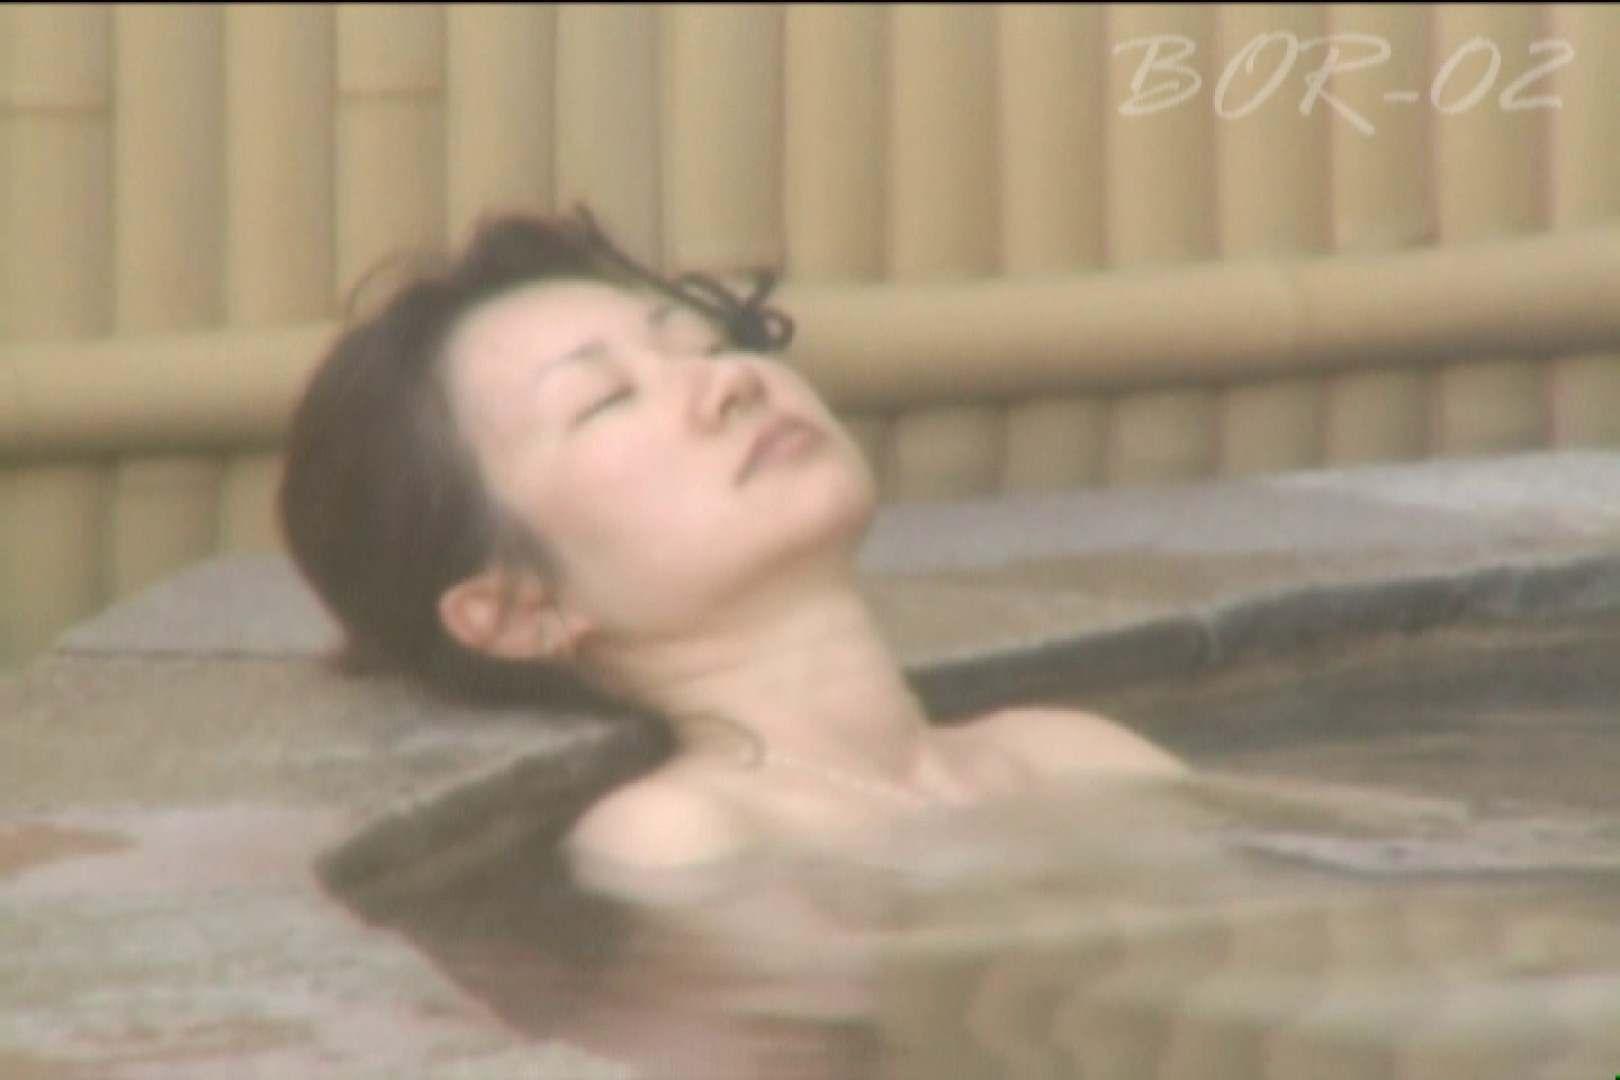 Aquaな露天風呂Vol.477 盗撮   OLエロ画像  99PICs 64